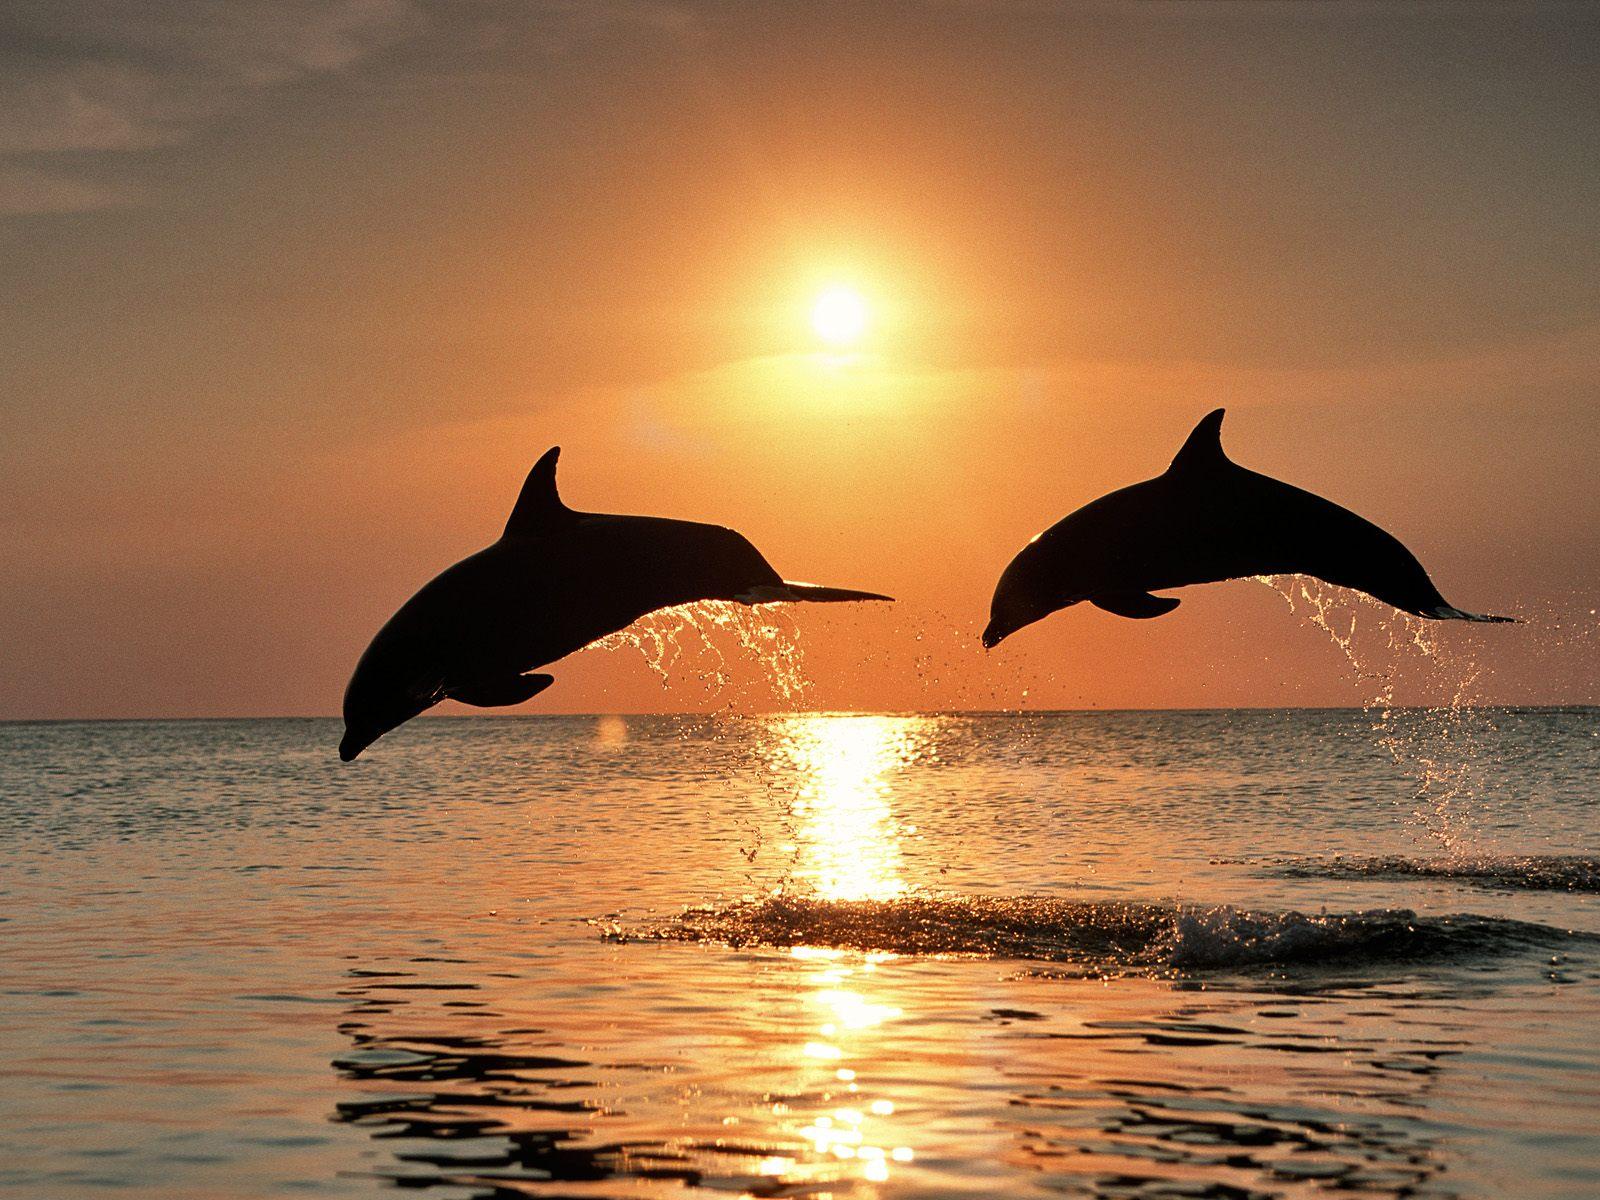 The-best-top-desktop-dolphin-wallpapers-hd-dolphins-wallpaper-2